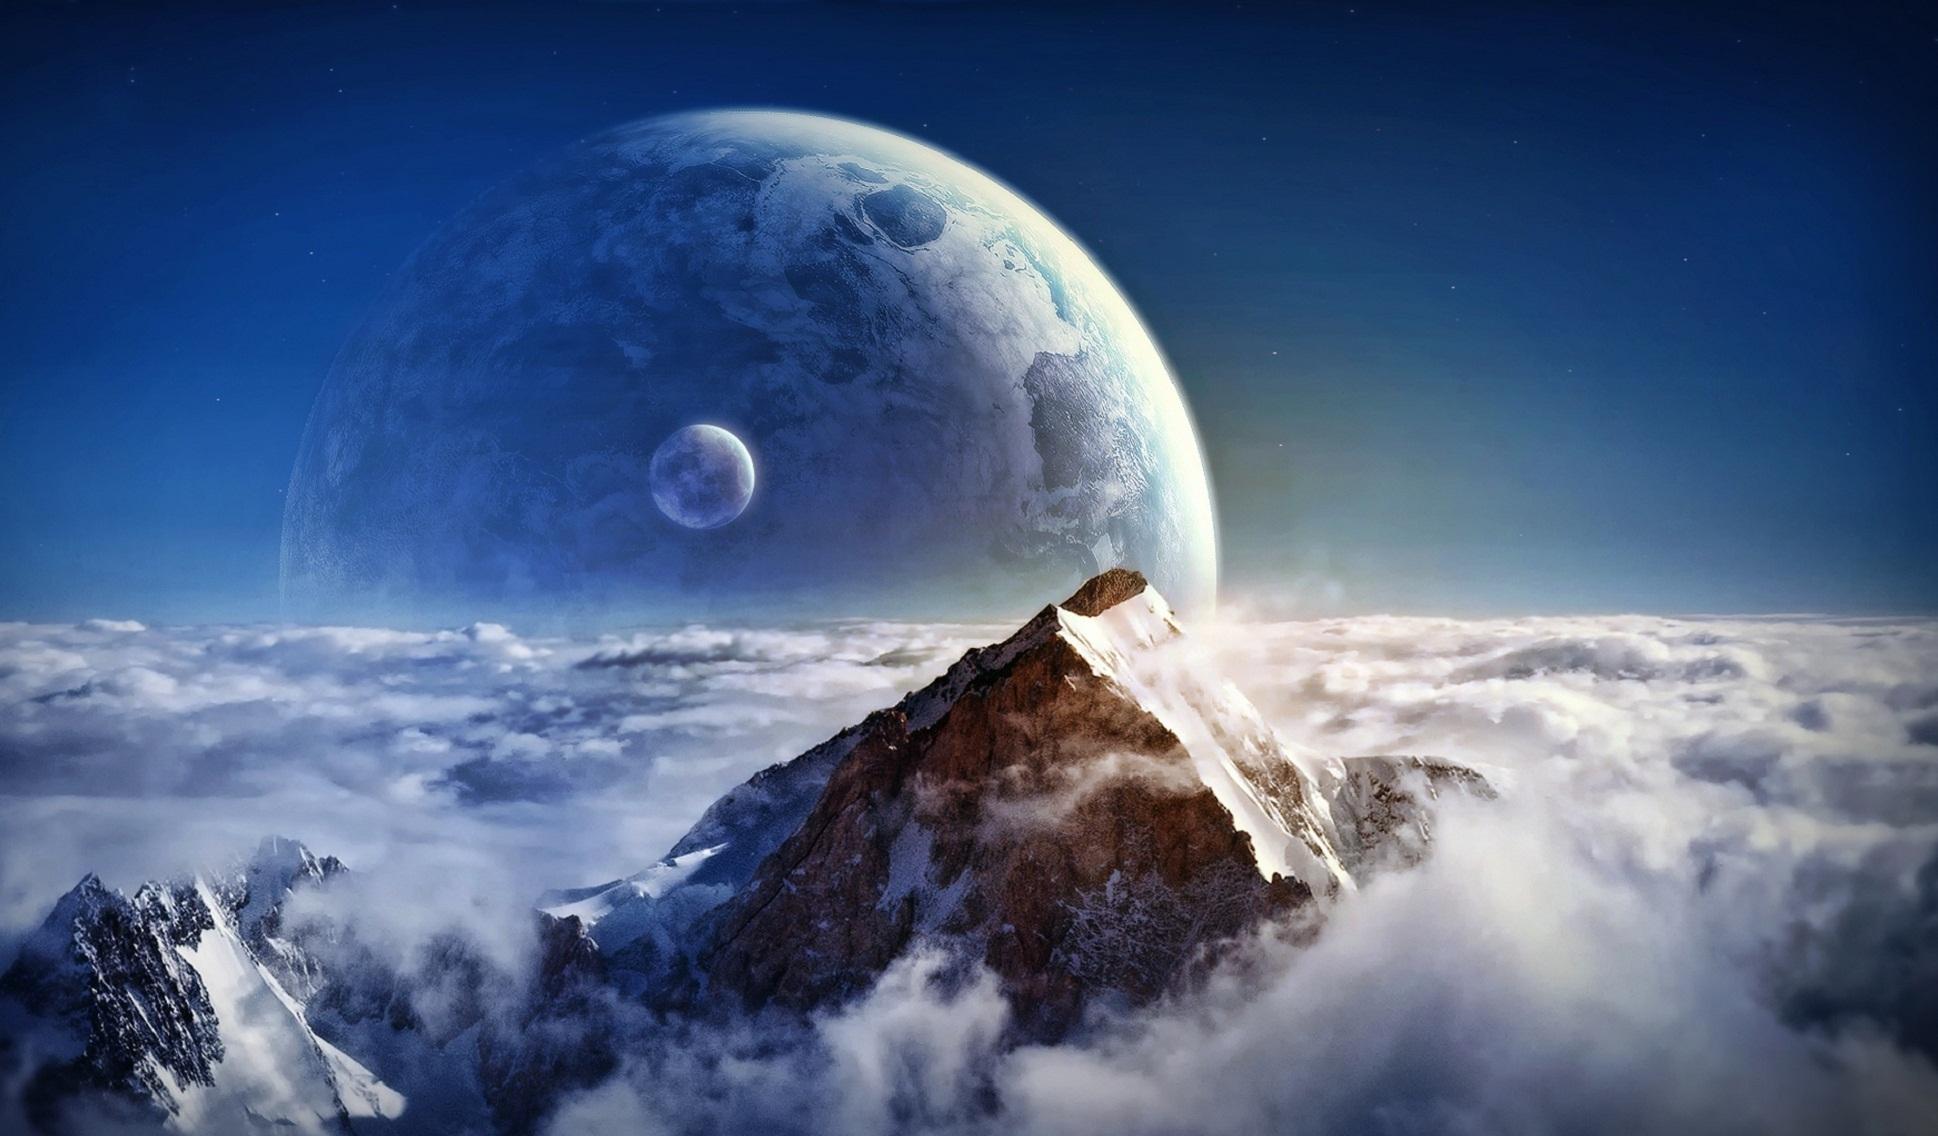 Planet Rise Backgrounds, Compatible - PC, Mobile, Gadgets| 1938x1136 px